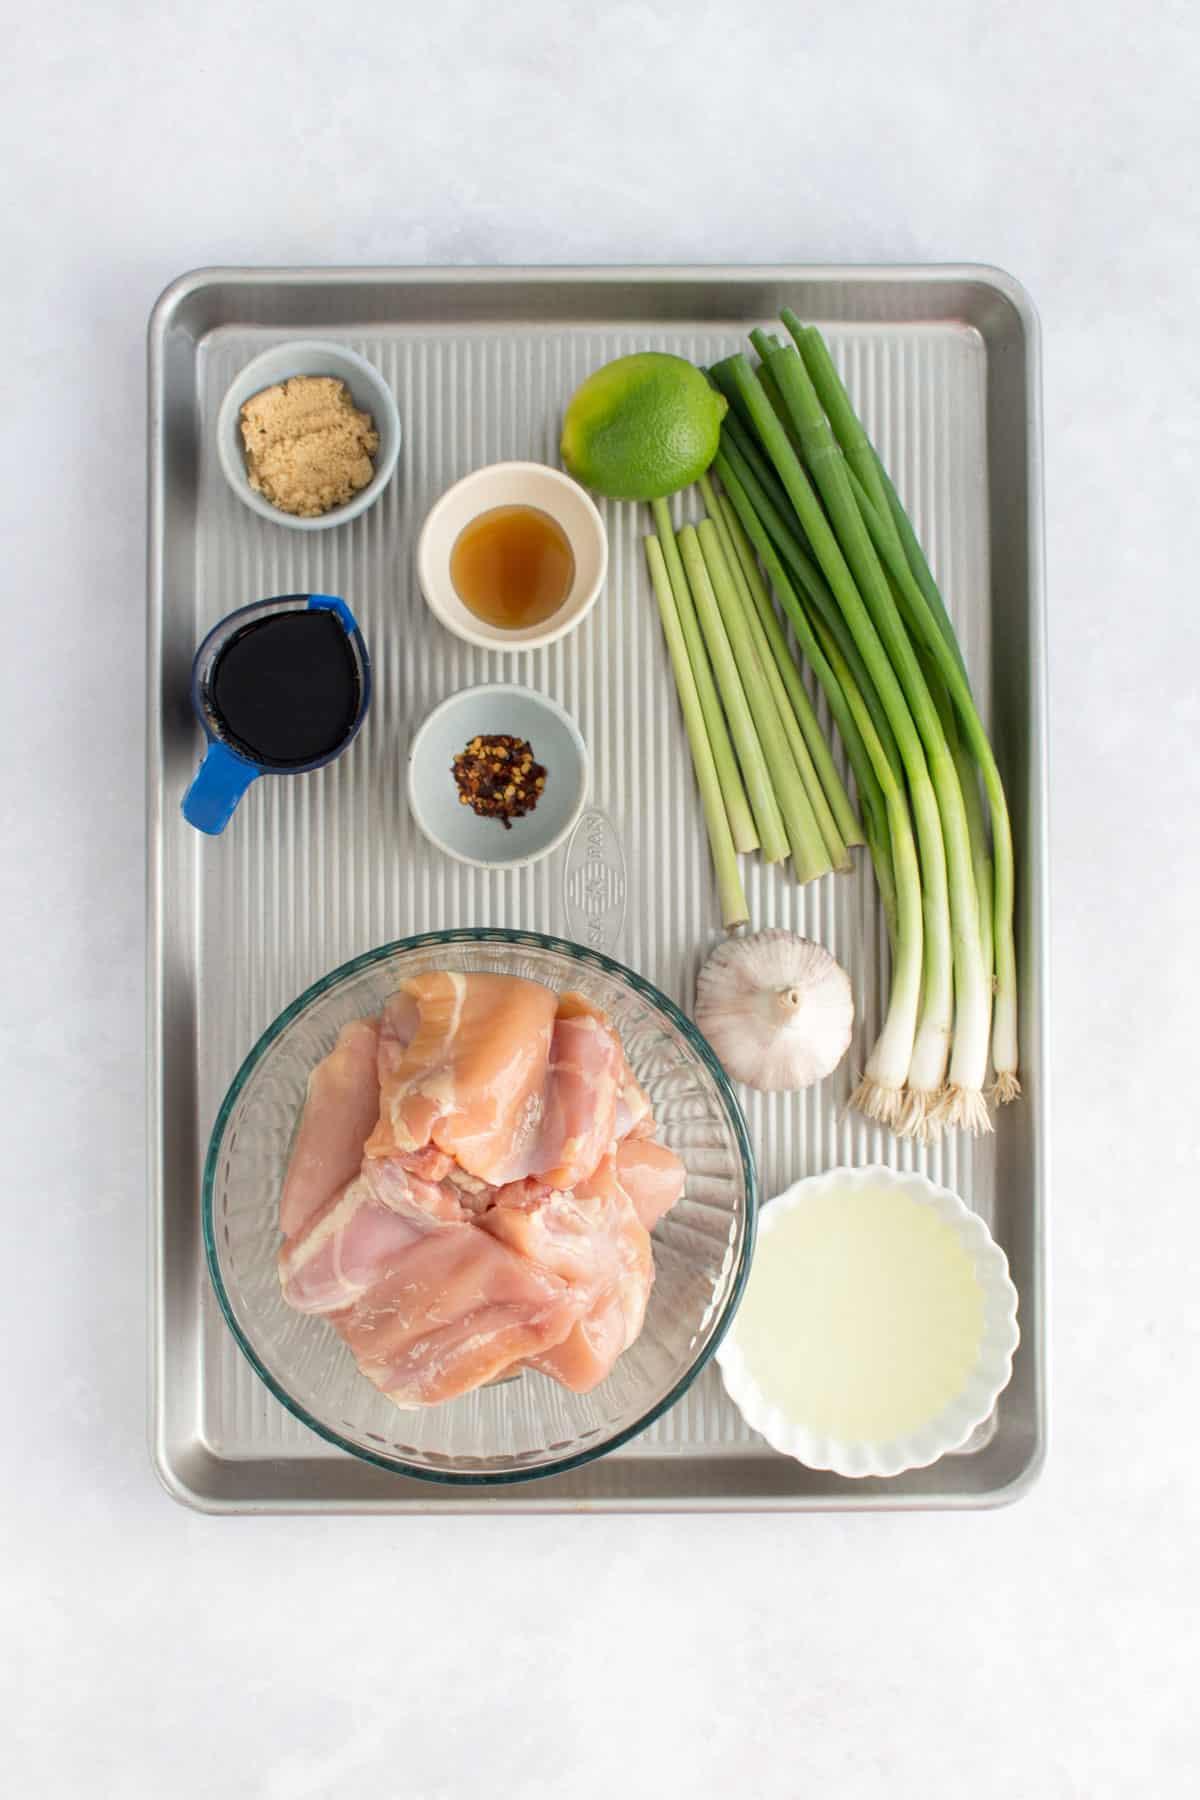 Ingredients for lemongrass chicken in a sheet pan.